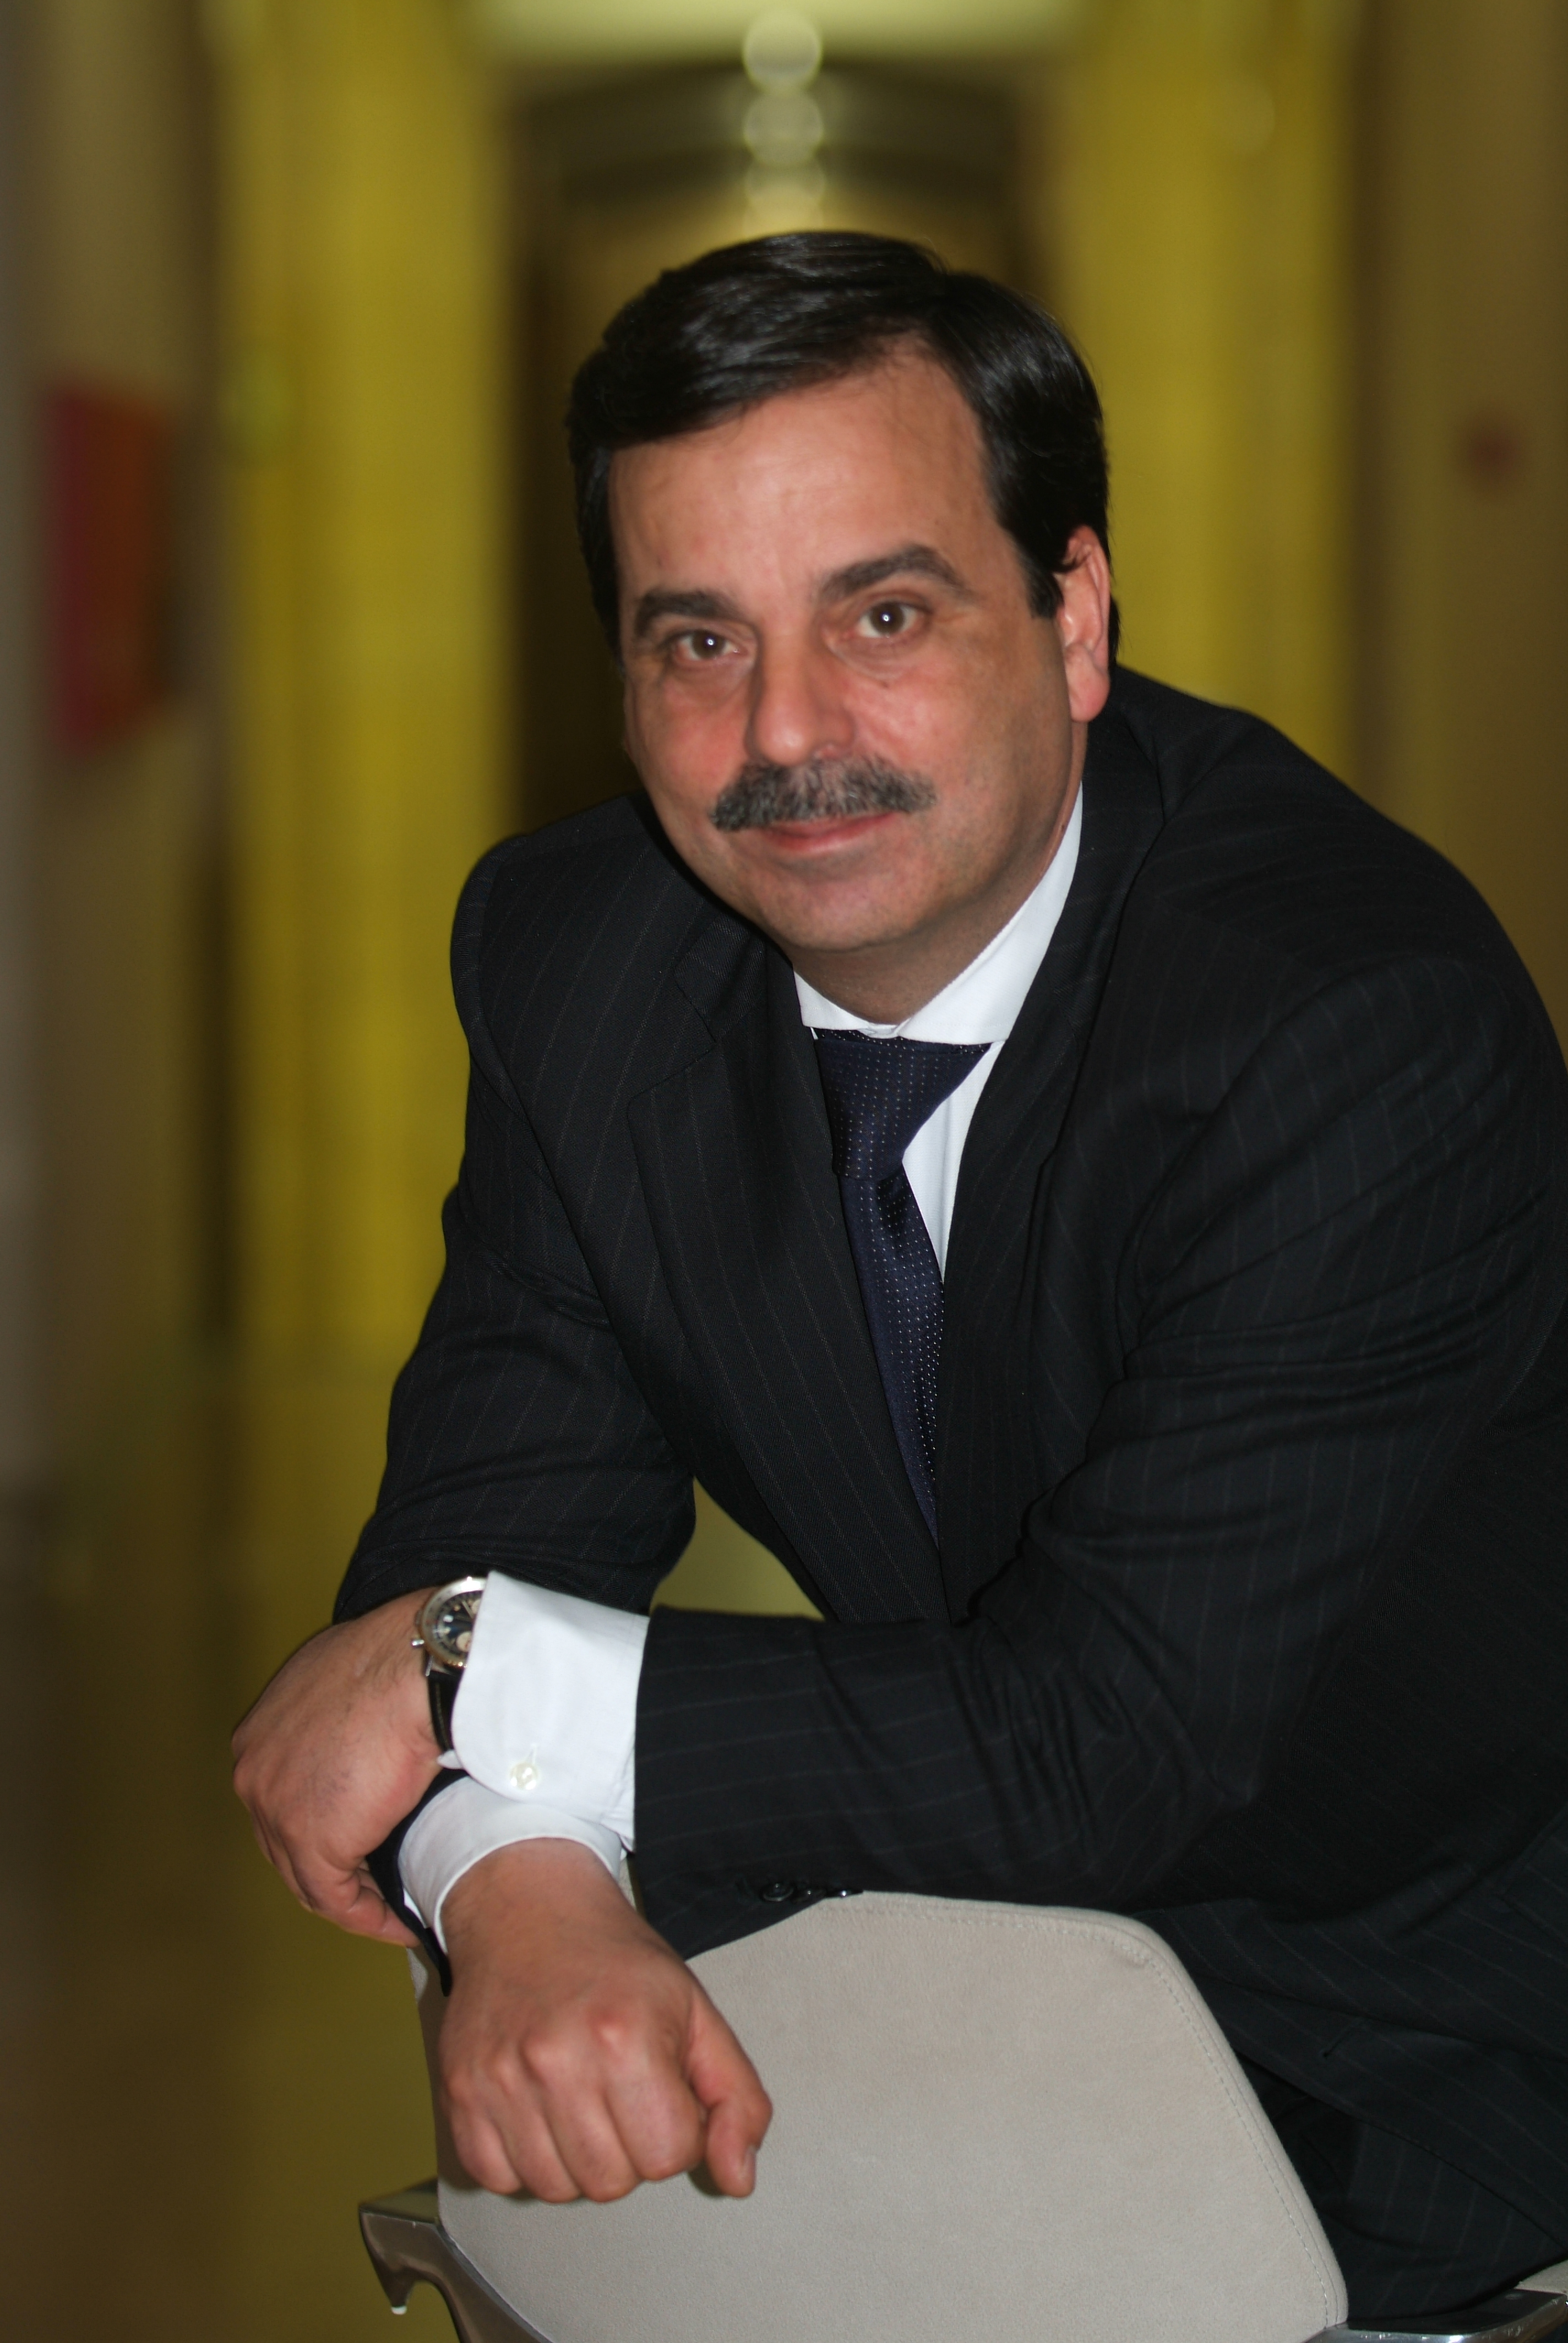 Volkswagen Group Of America Appoints Mario Guerreiro As